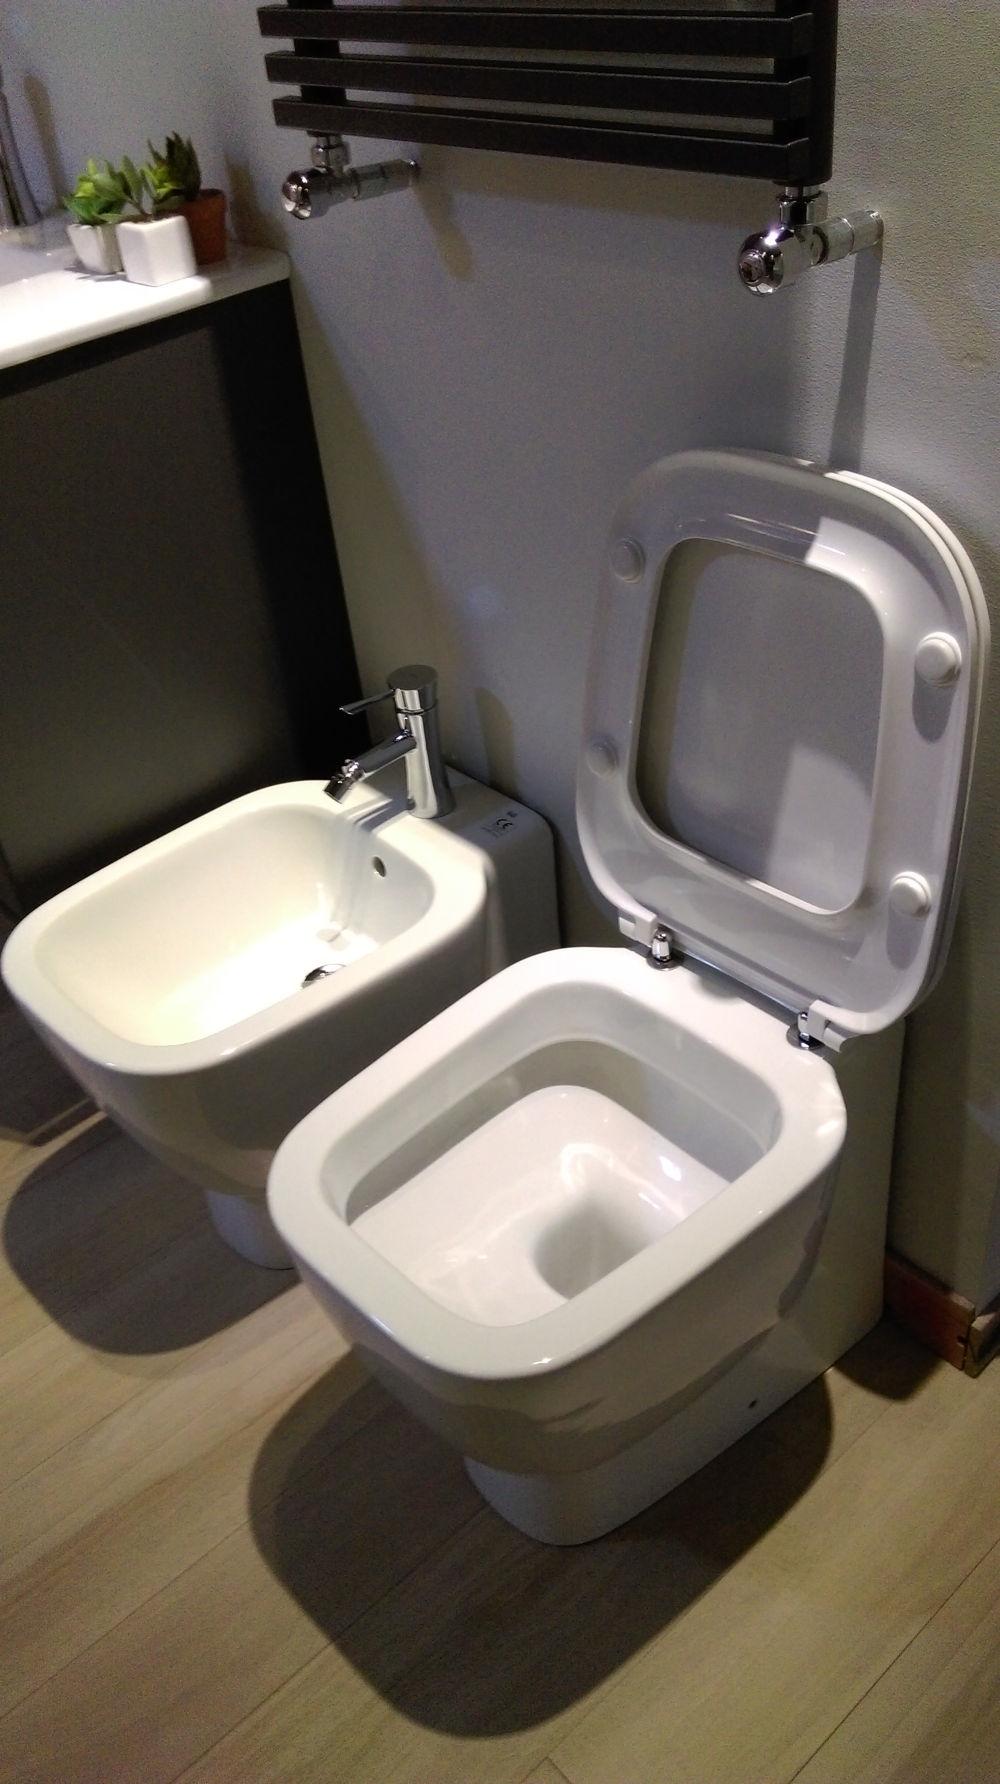 sanitari moderni a terra serie one